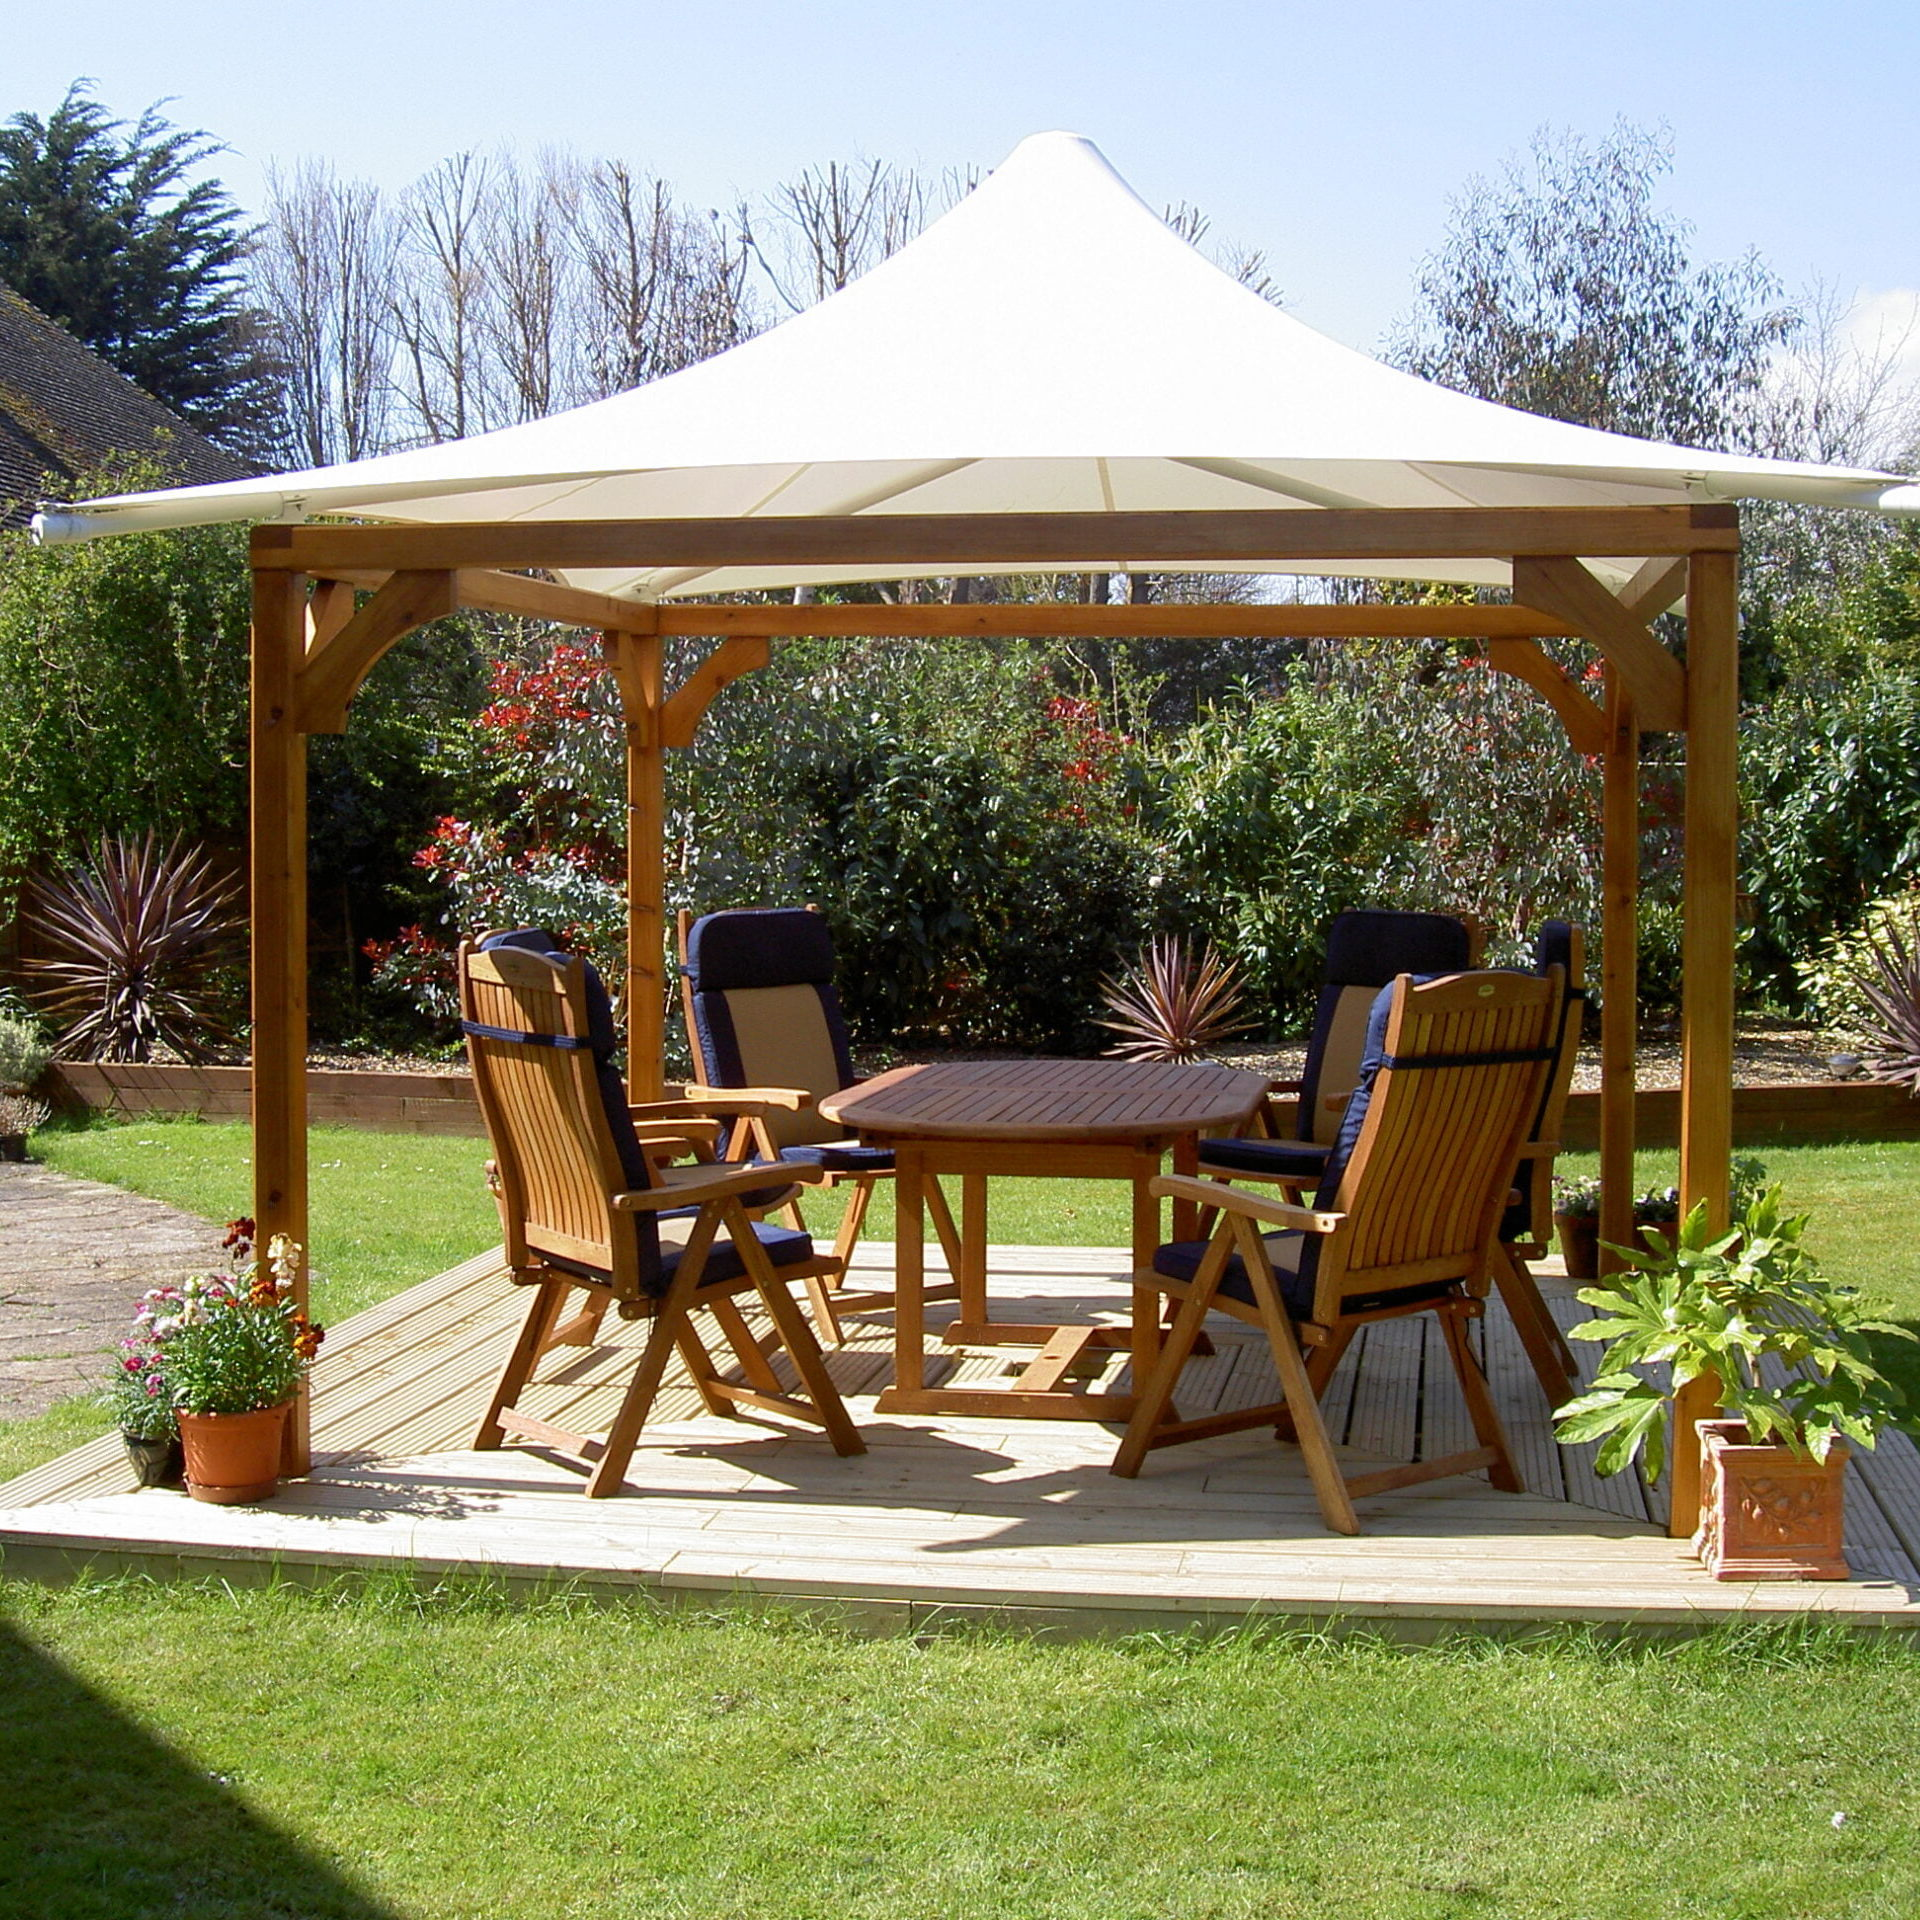 Amberley Tensile Fabric Conic Garden Shade Canopy